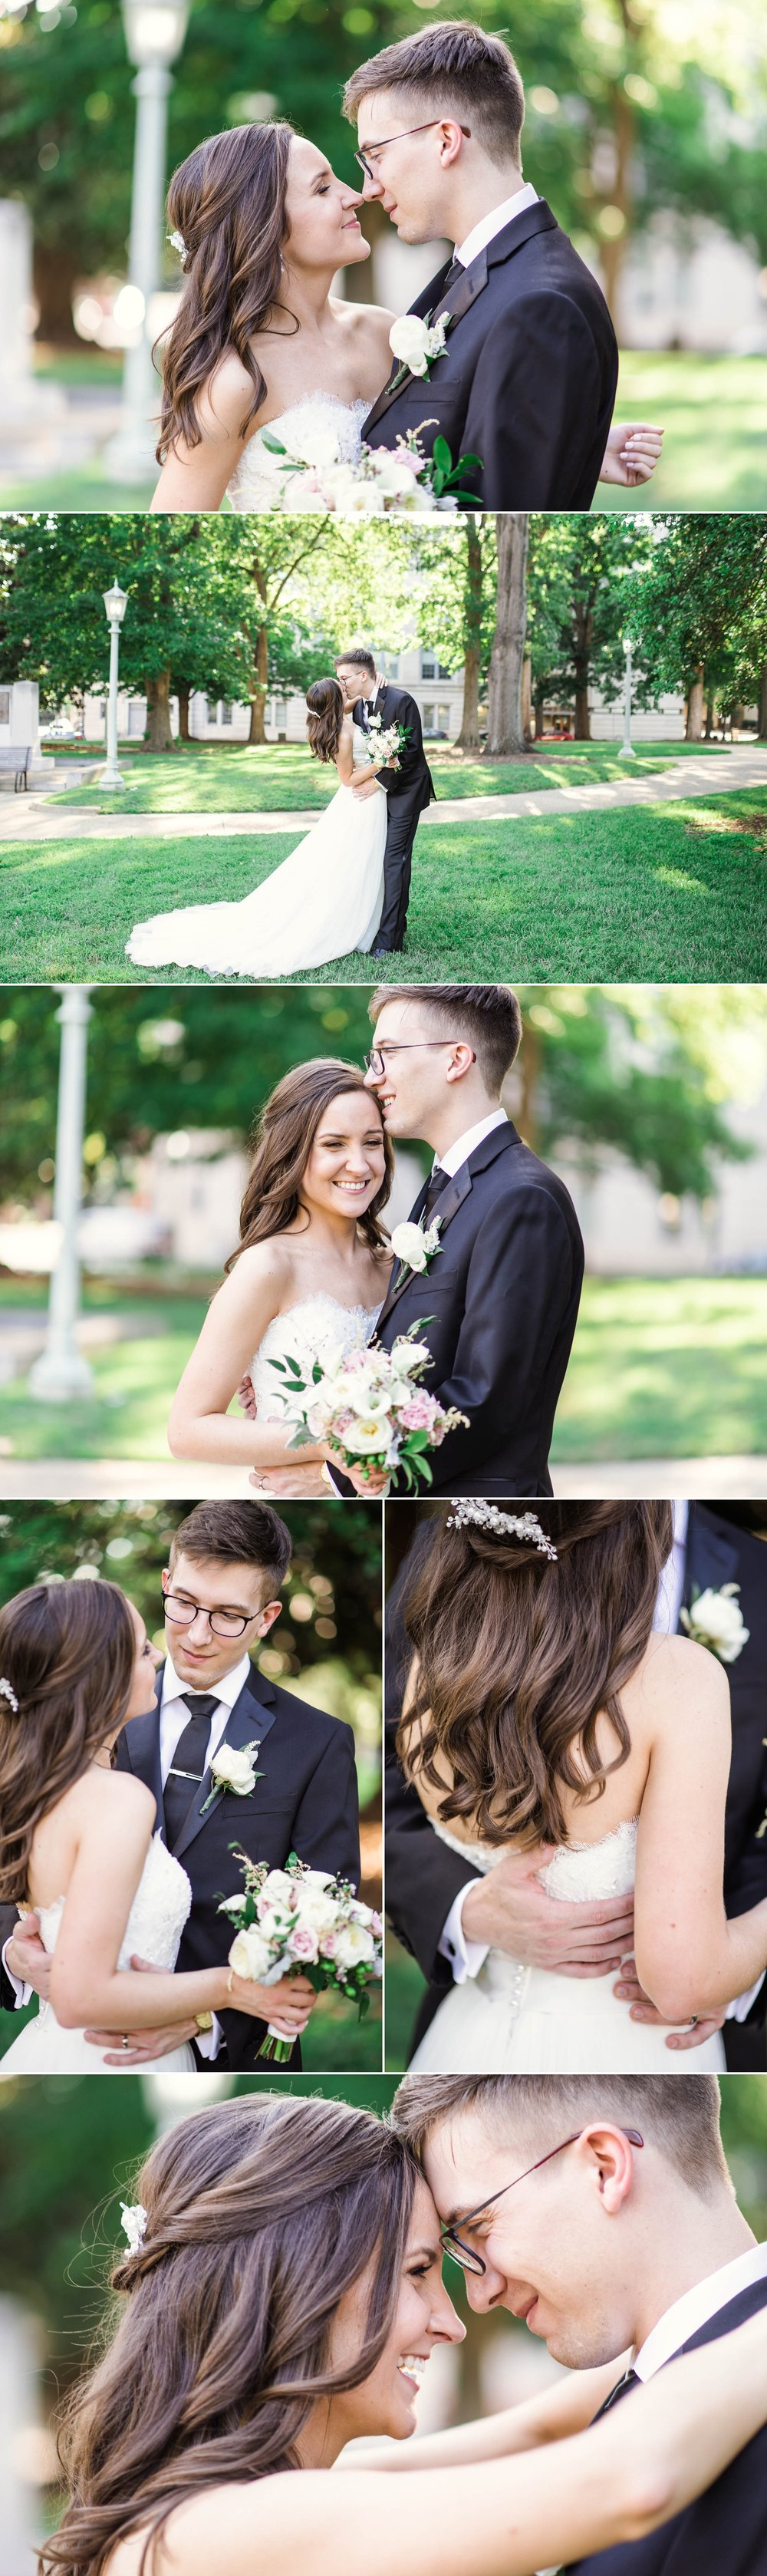 Elizabeth + Kane - Wedding at the Stockroom at 230 - Raleigh North Carolina Wedding Photographer 12.jpg